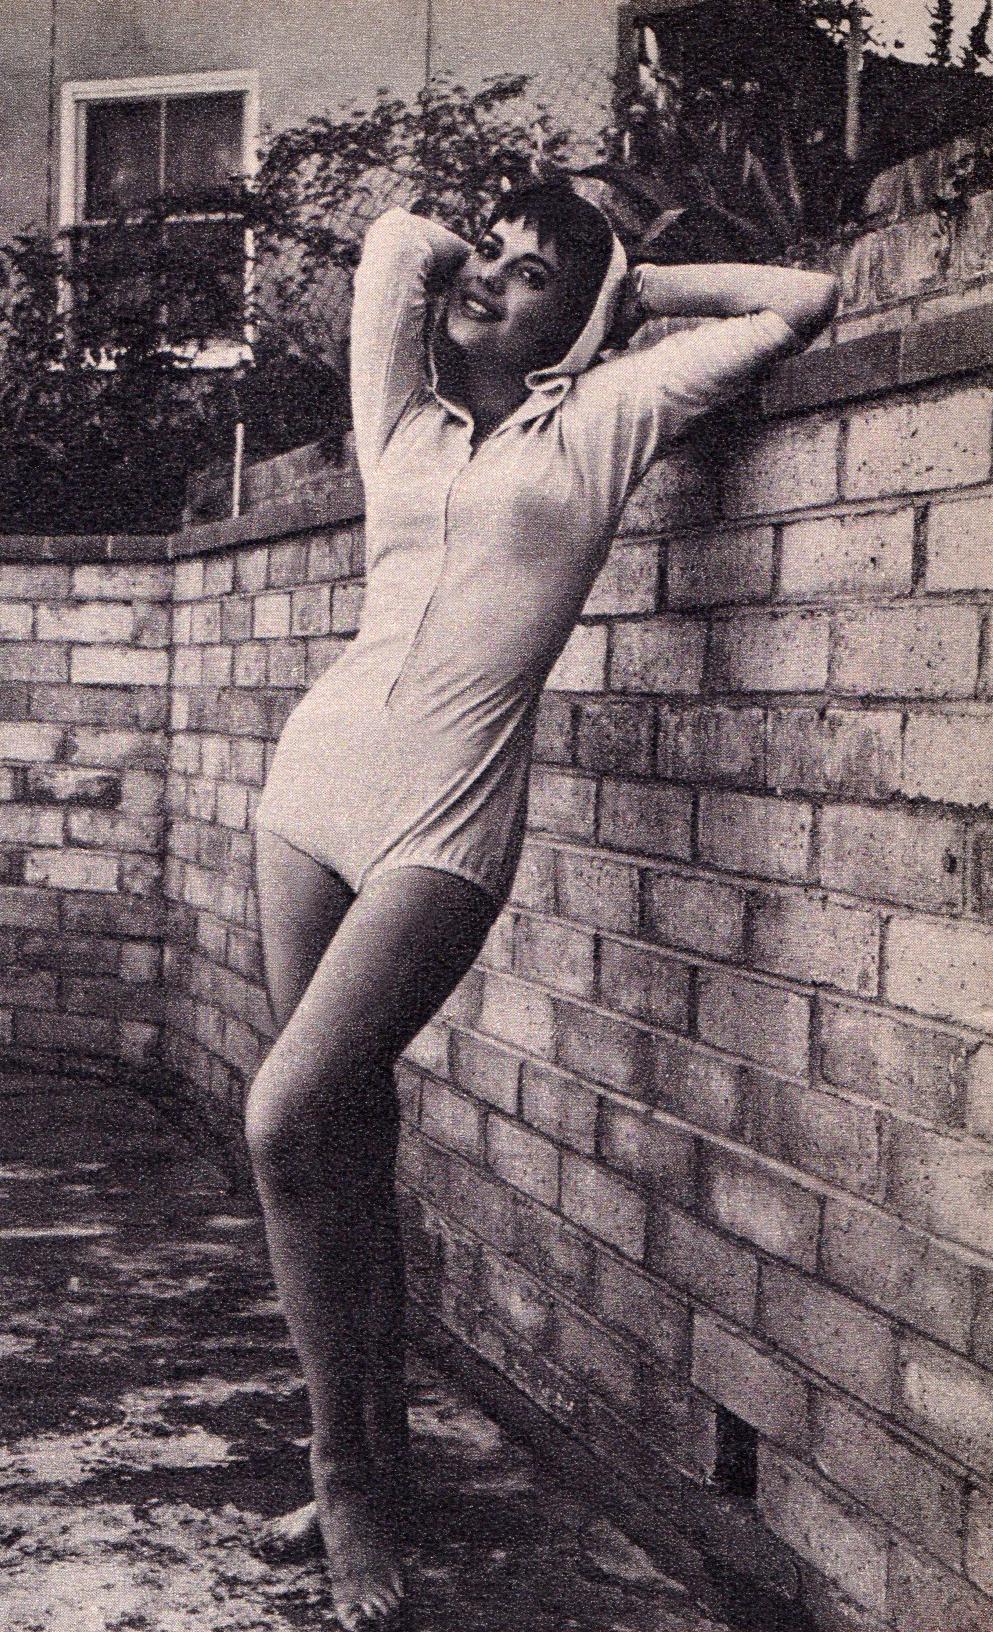 https://pics.wikifeet.com/Natalie-Wood-Feet-2052519.jpg